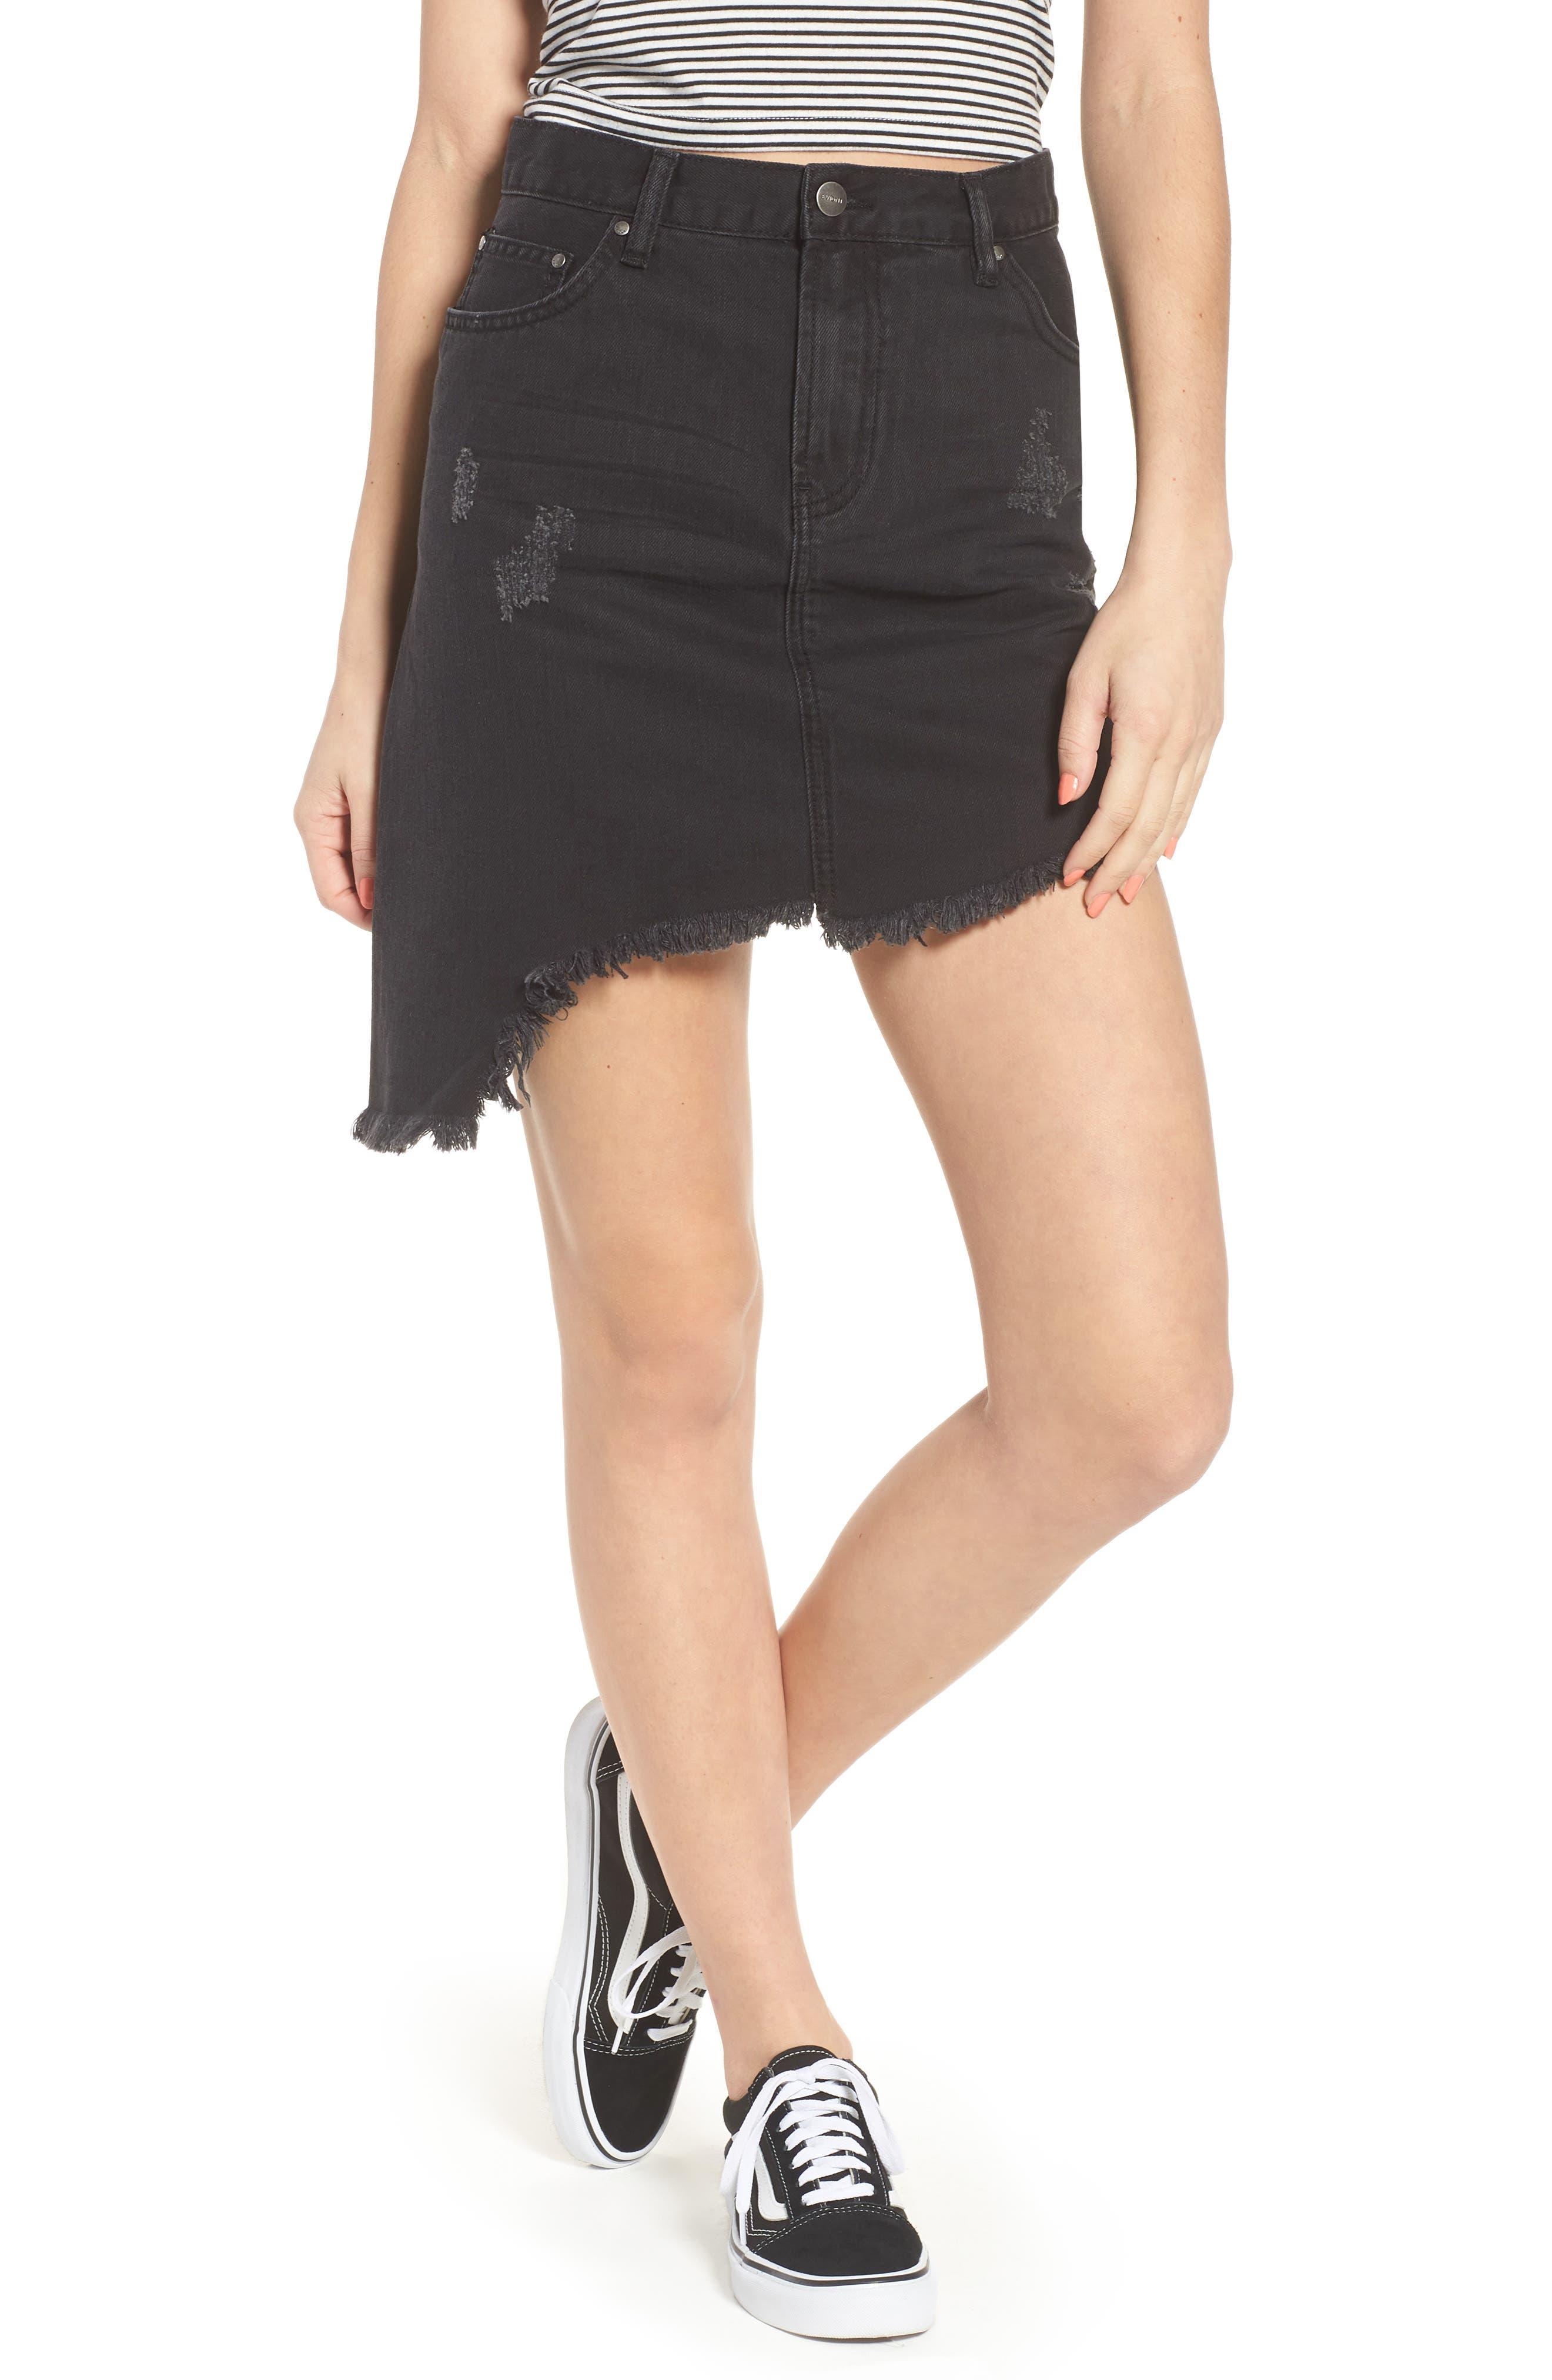 EVDNT Modena Asymmetrical Denim Skirt,                             Main thumbnail 1, color,                             Black Sheep